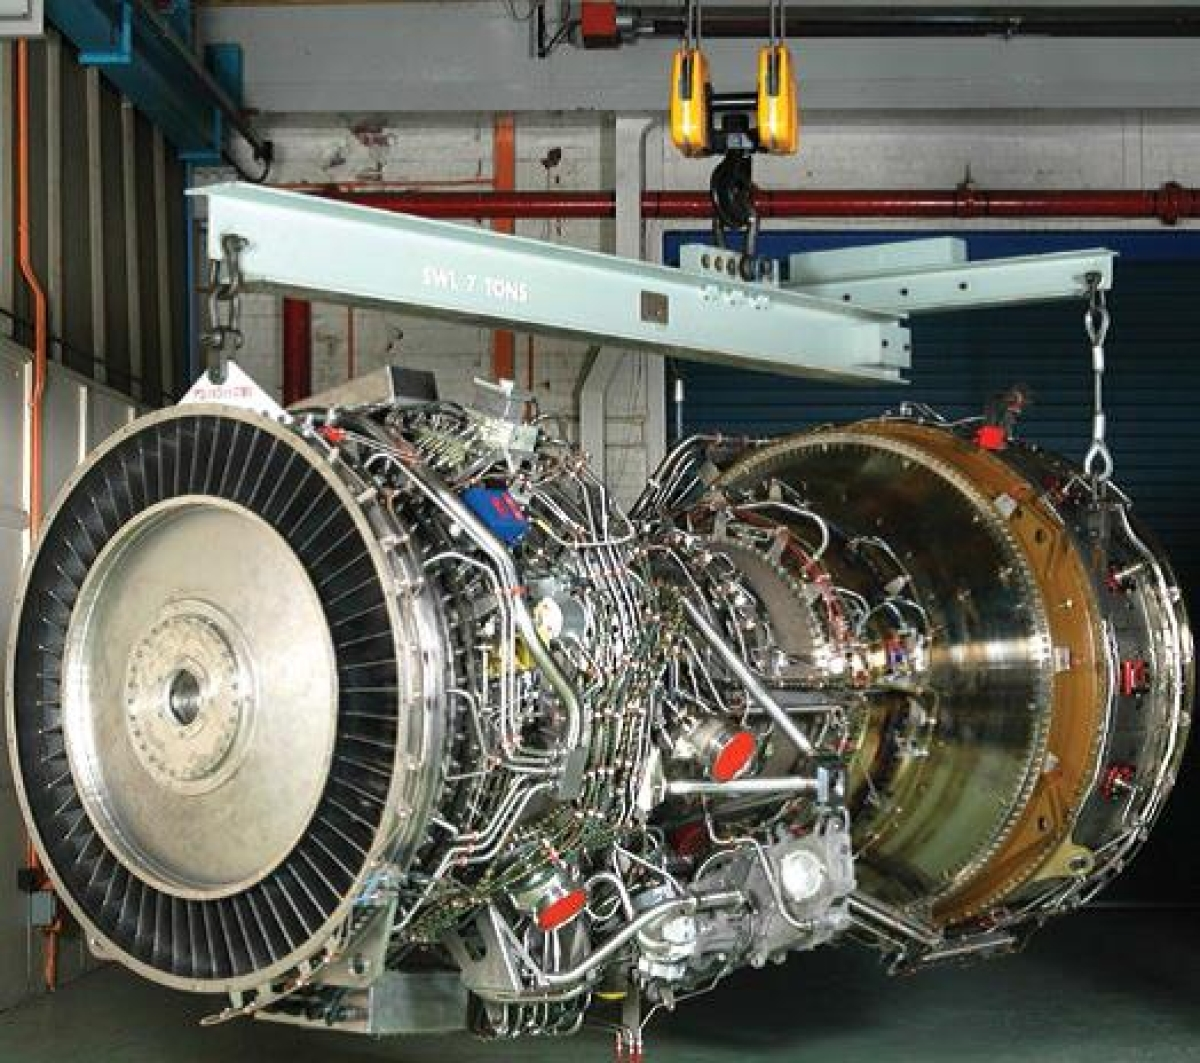 Rolls-Royce and HAL Sign MoU for Supporting MT30 Marine Engine Business | MT30 கடல்சார் இயந்திர வணிகத்தை ஆதரிப்பதற்கான ரோல்ஸ் ராய்ஸ் மற்றும் HAL புரிந்துணர்வு ஒப்பந்தம் கையெழுத்திட்டுள்ளன |_40.1